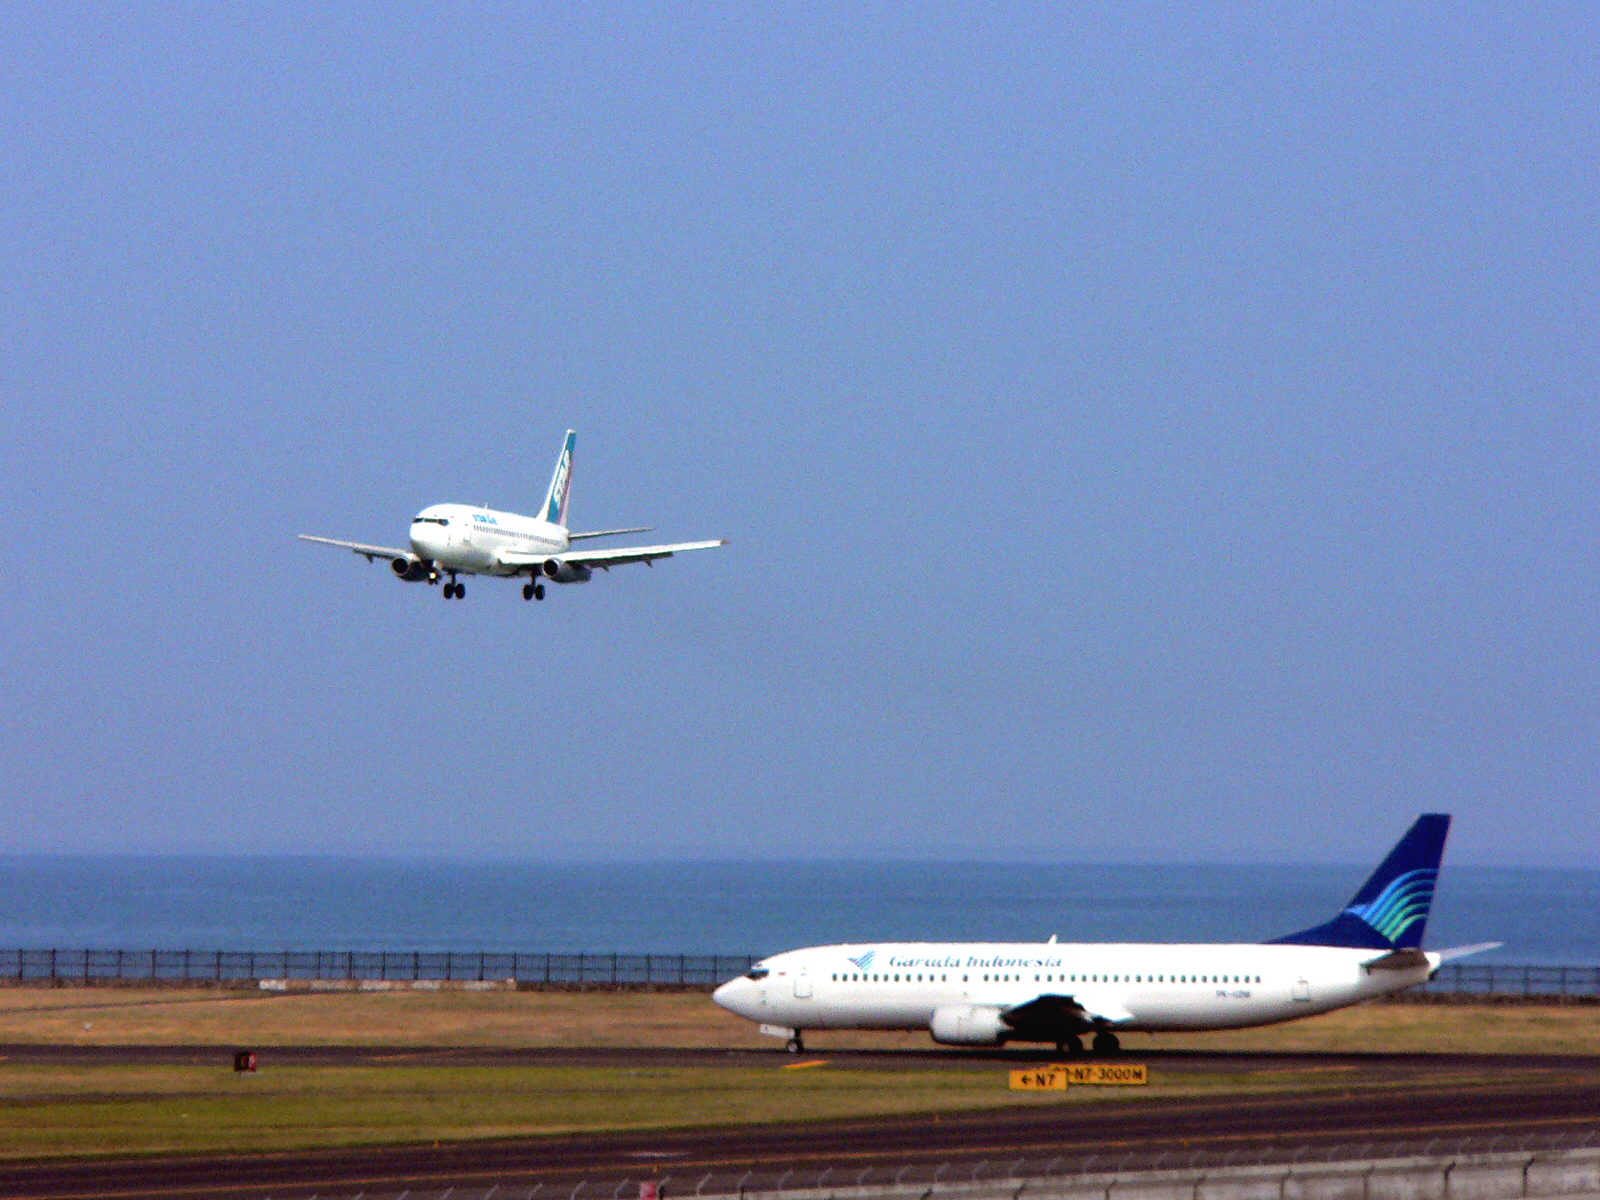 Happy landing, happy take off photo